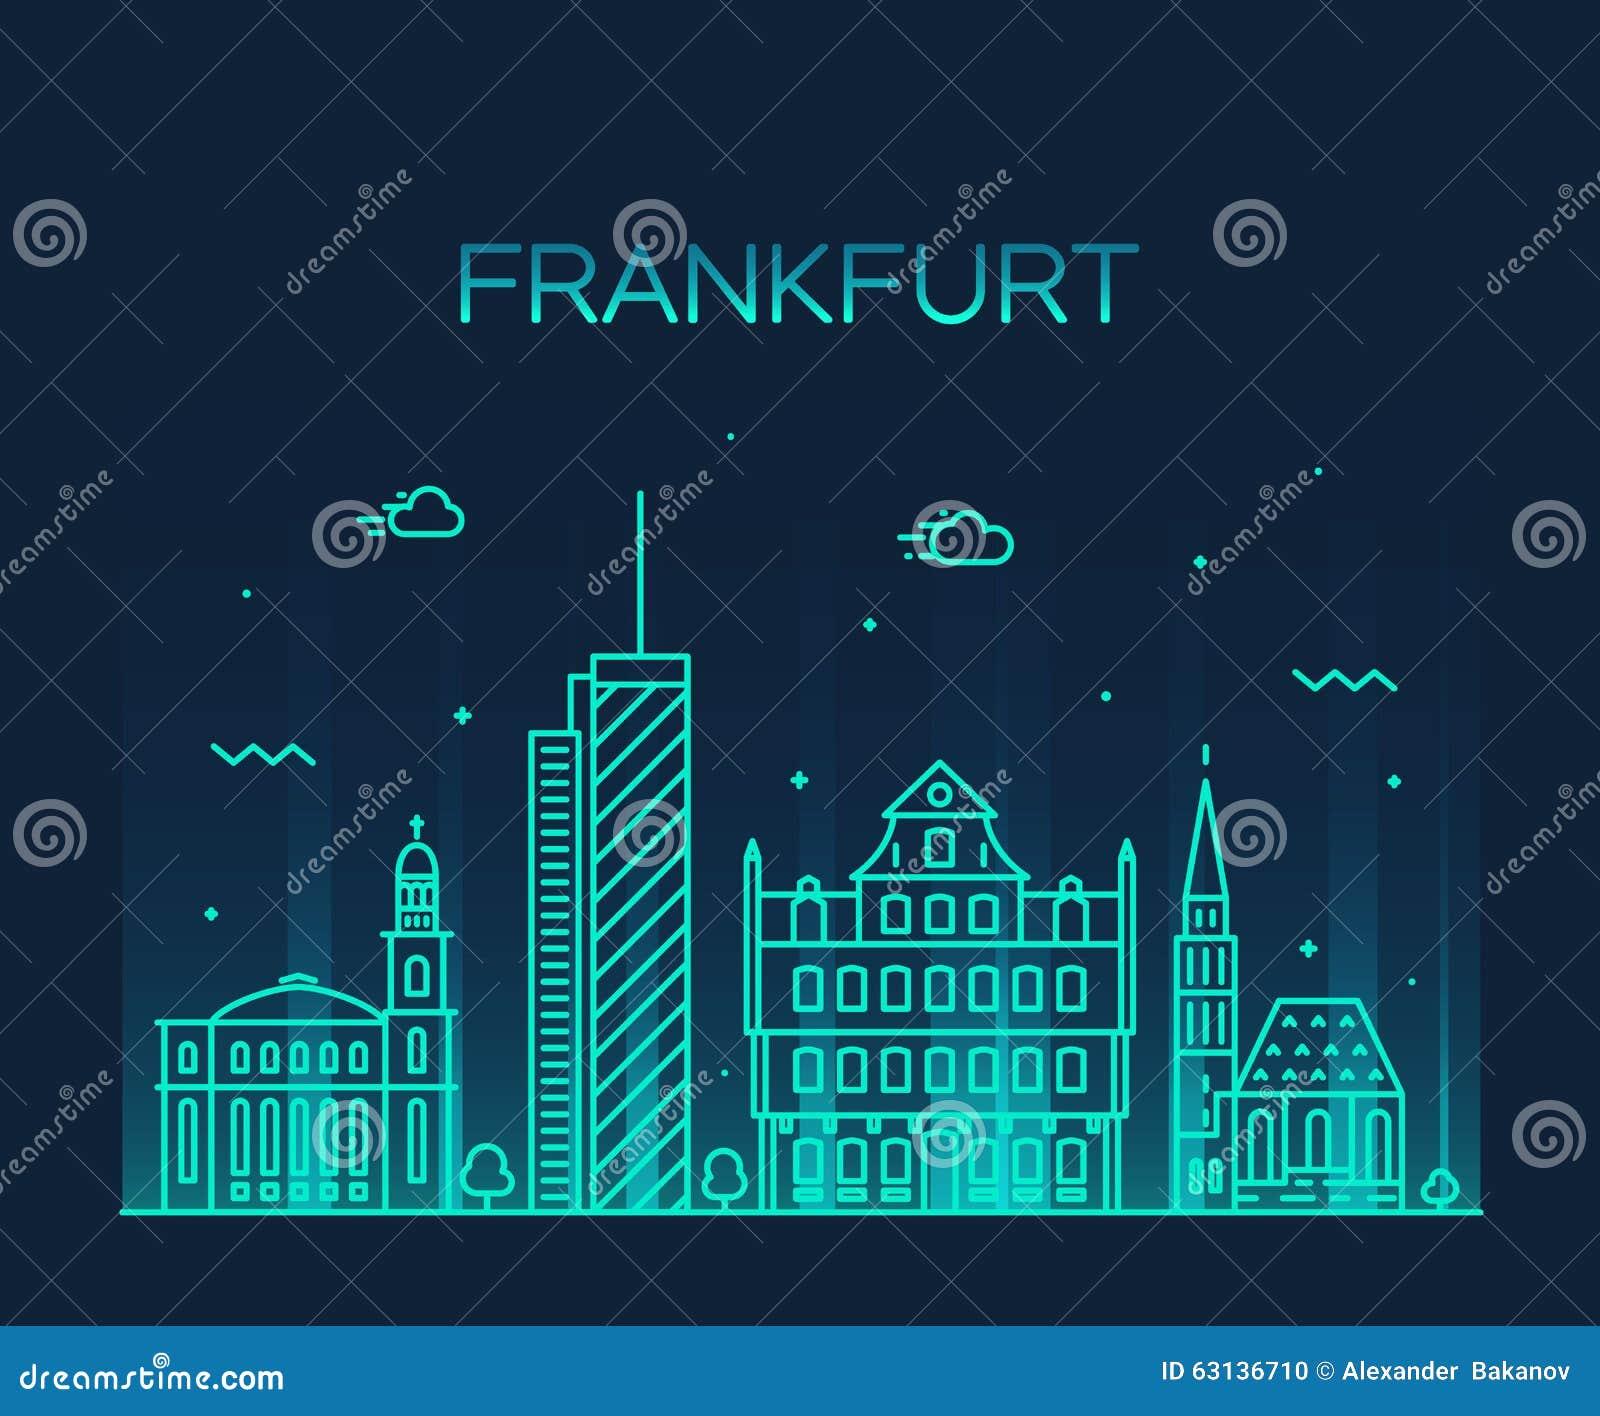 Frankfurt skyline vector illustration linear style stock for Graphic design frankfurt